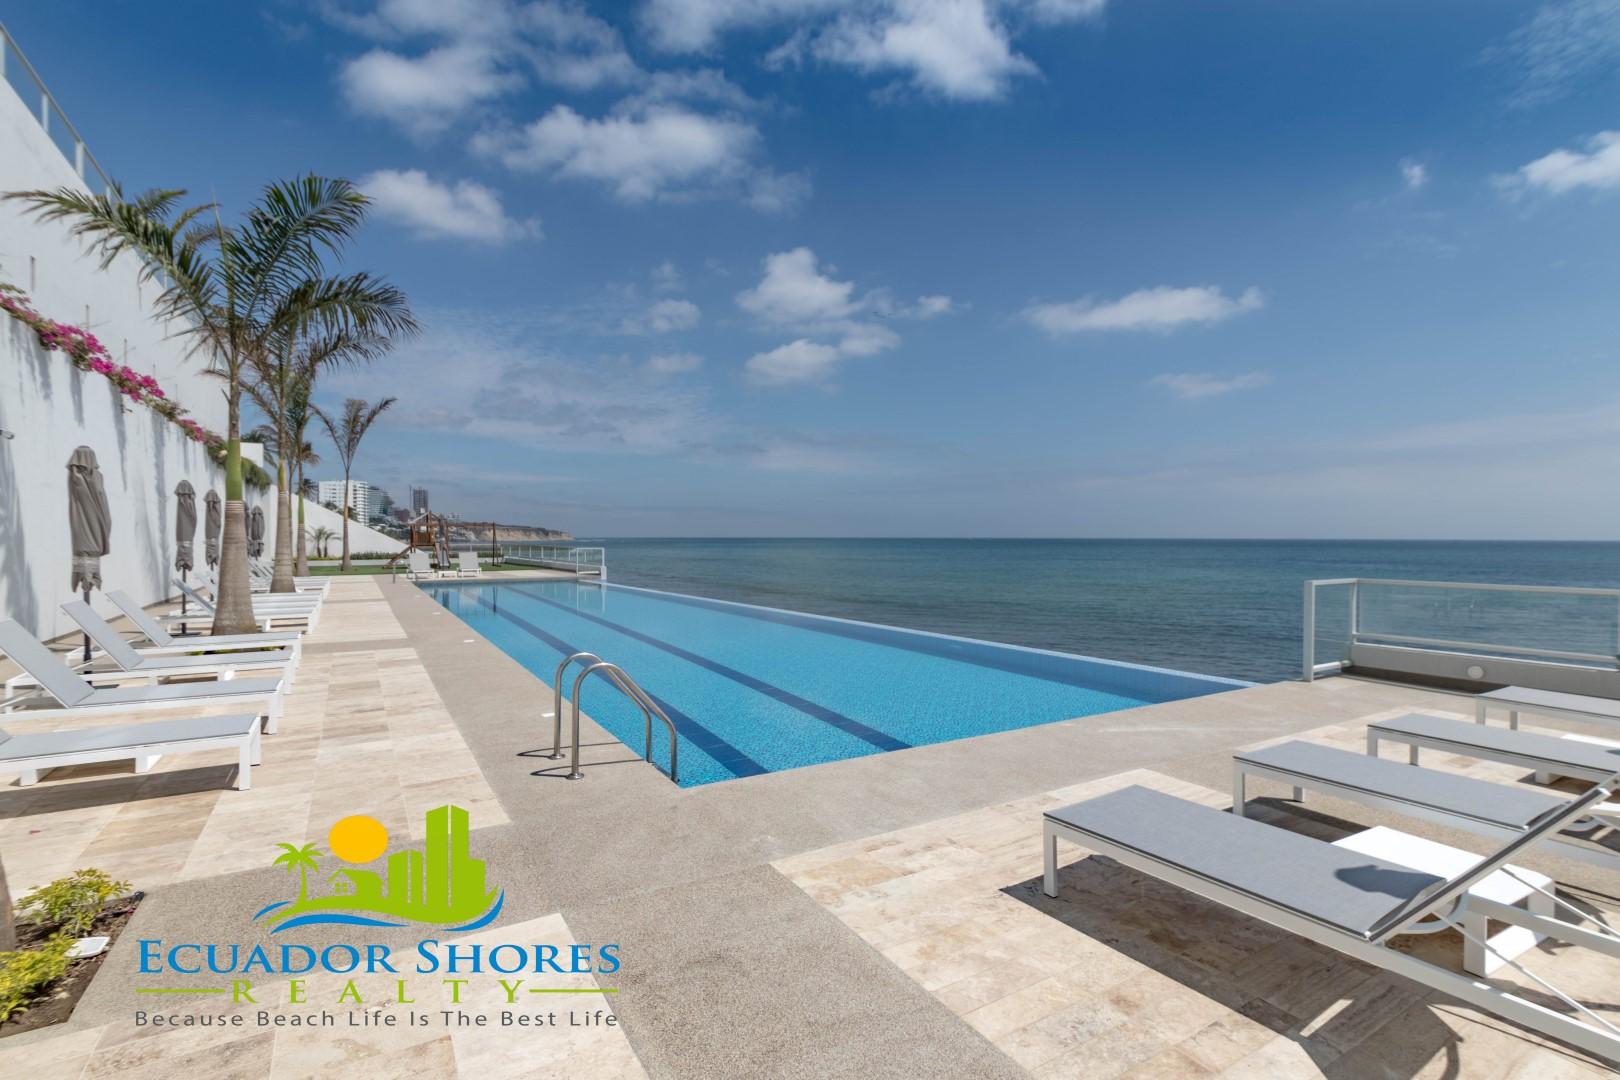 Ibiza condo Manta Ecuador 2 bedroom ocean/city/mountian views!!**VIDEO**